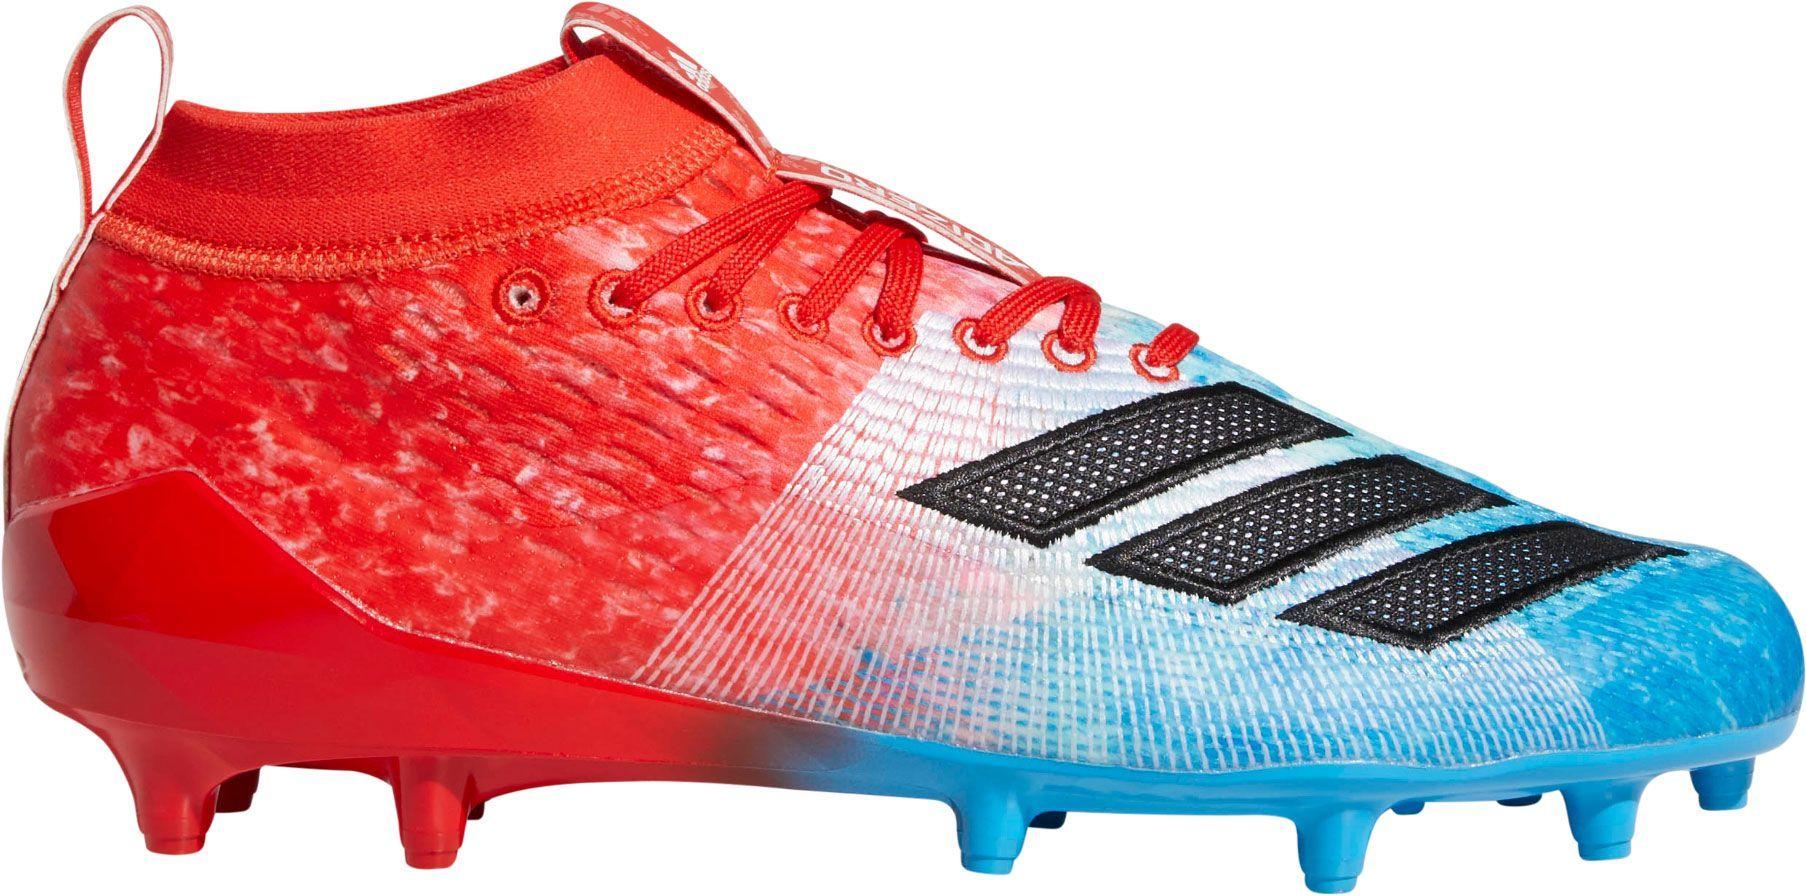 4f60cb2f262a36 adidas Men's adizero 8.0 Snow Cone Football Cleats, Size: 15.0, Blue